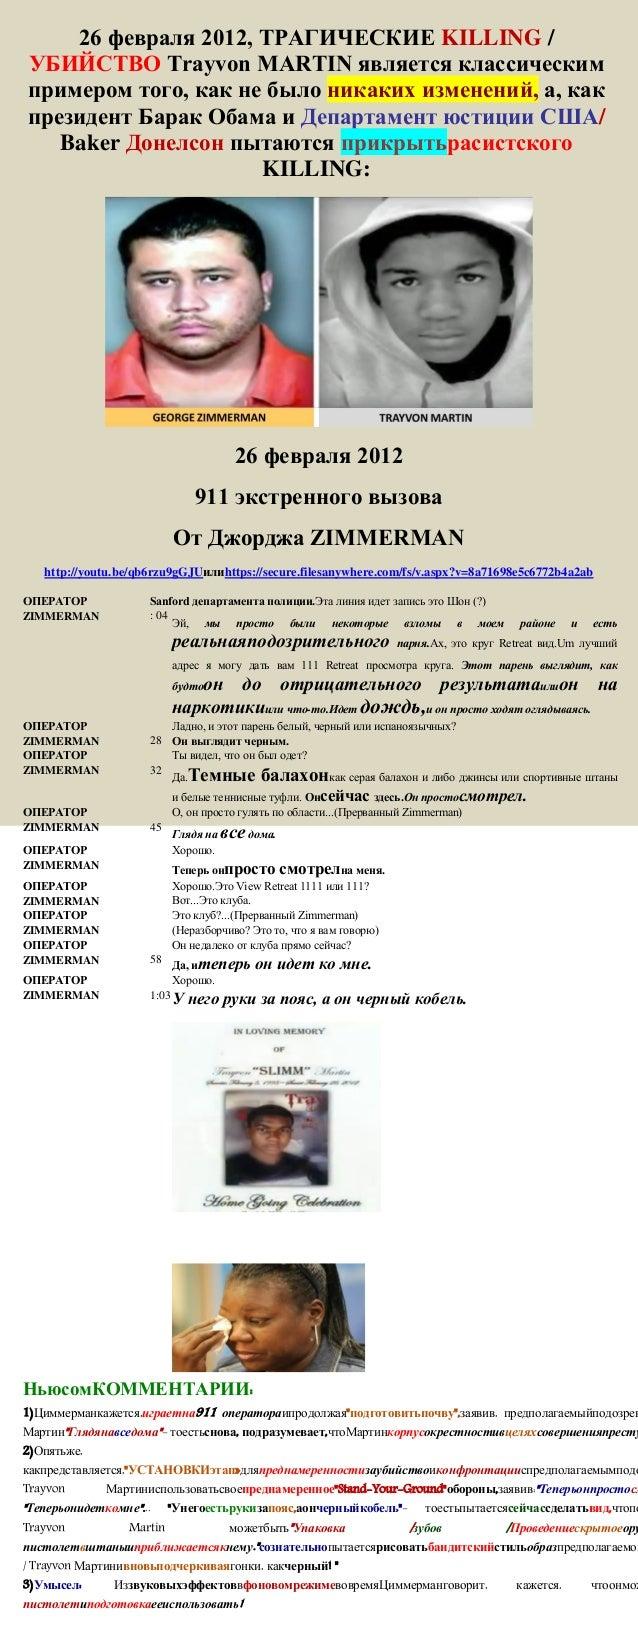 02/26/2012 GEORGE ZIMMERMAN'S EMERGENCY 911 CALL (russian)